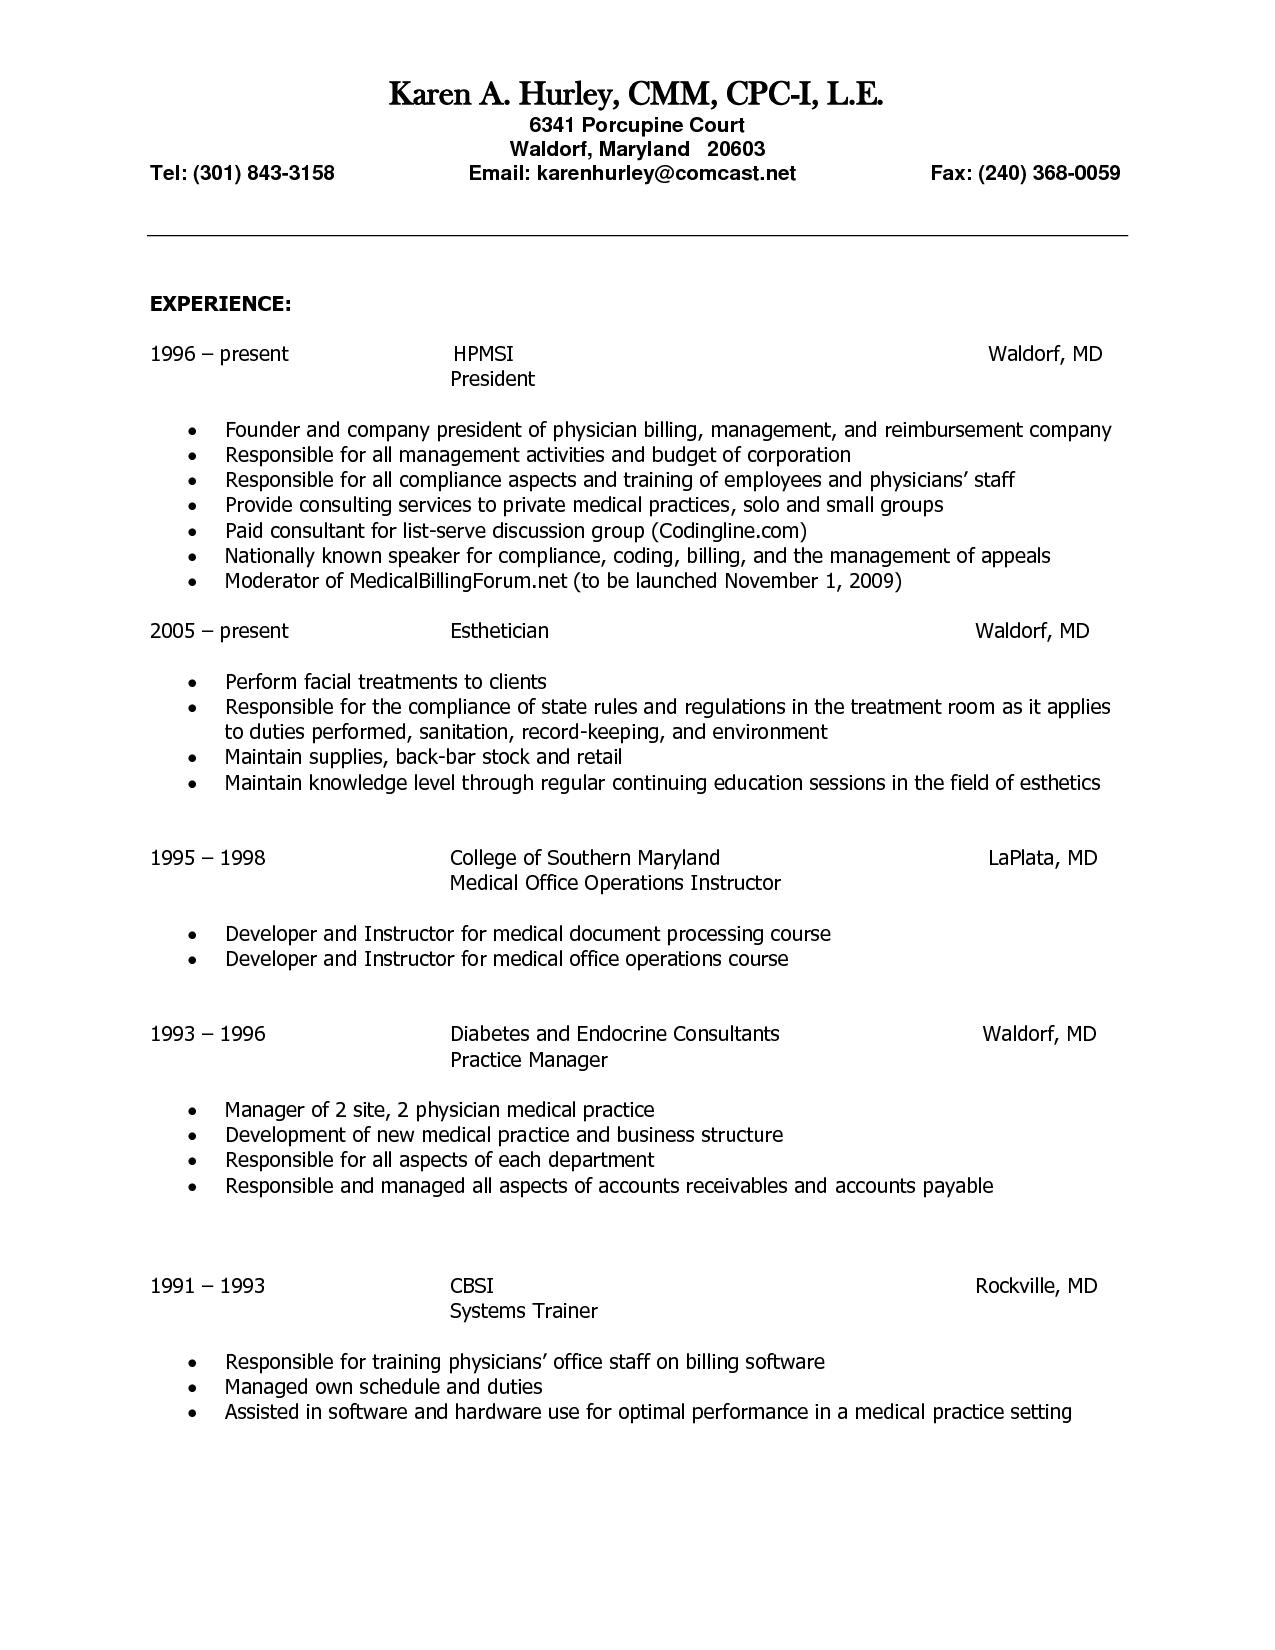 Esthetician Resume Esthetician Resume Cover Letter Sample  Tips And Tricks For